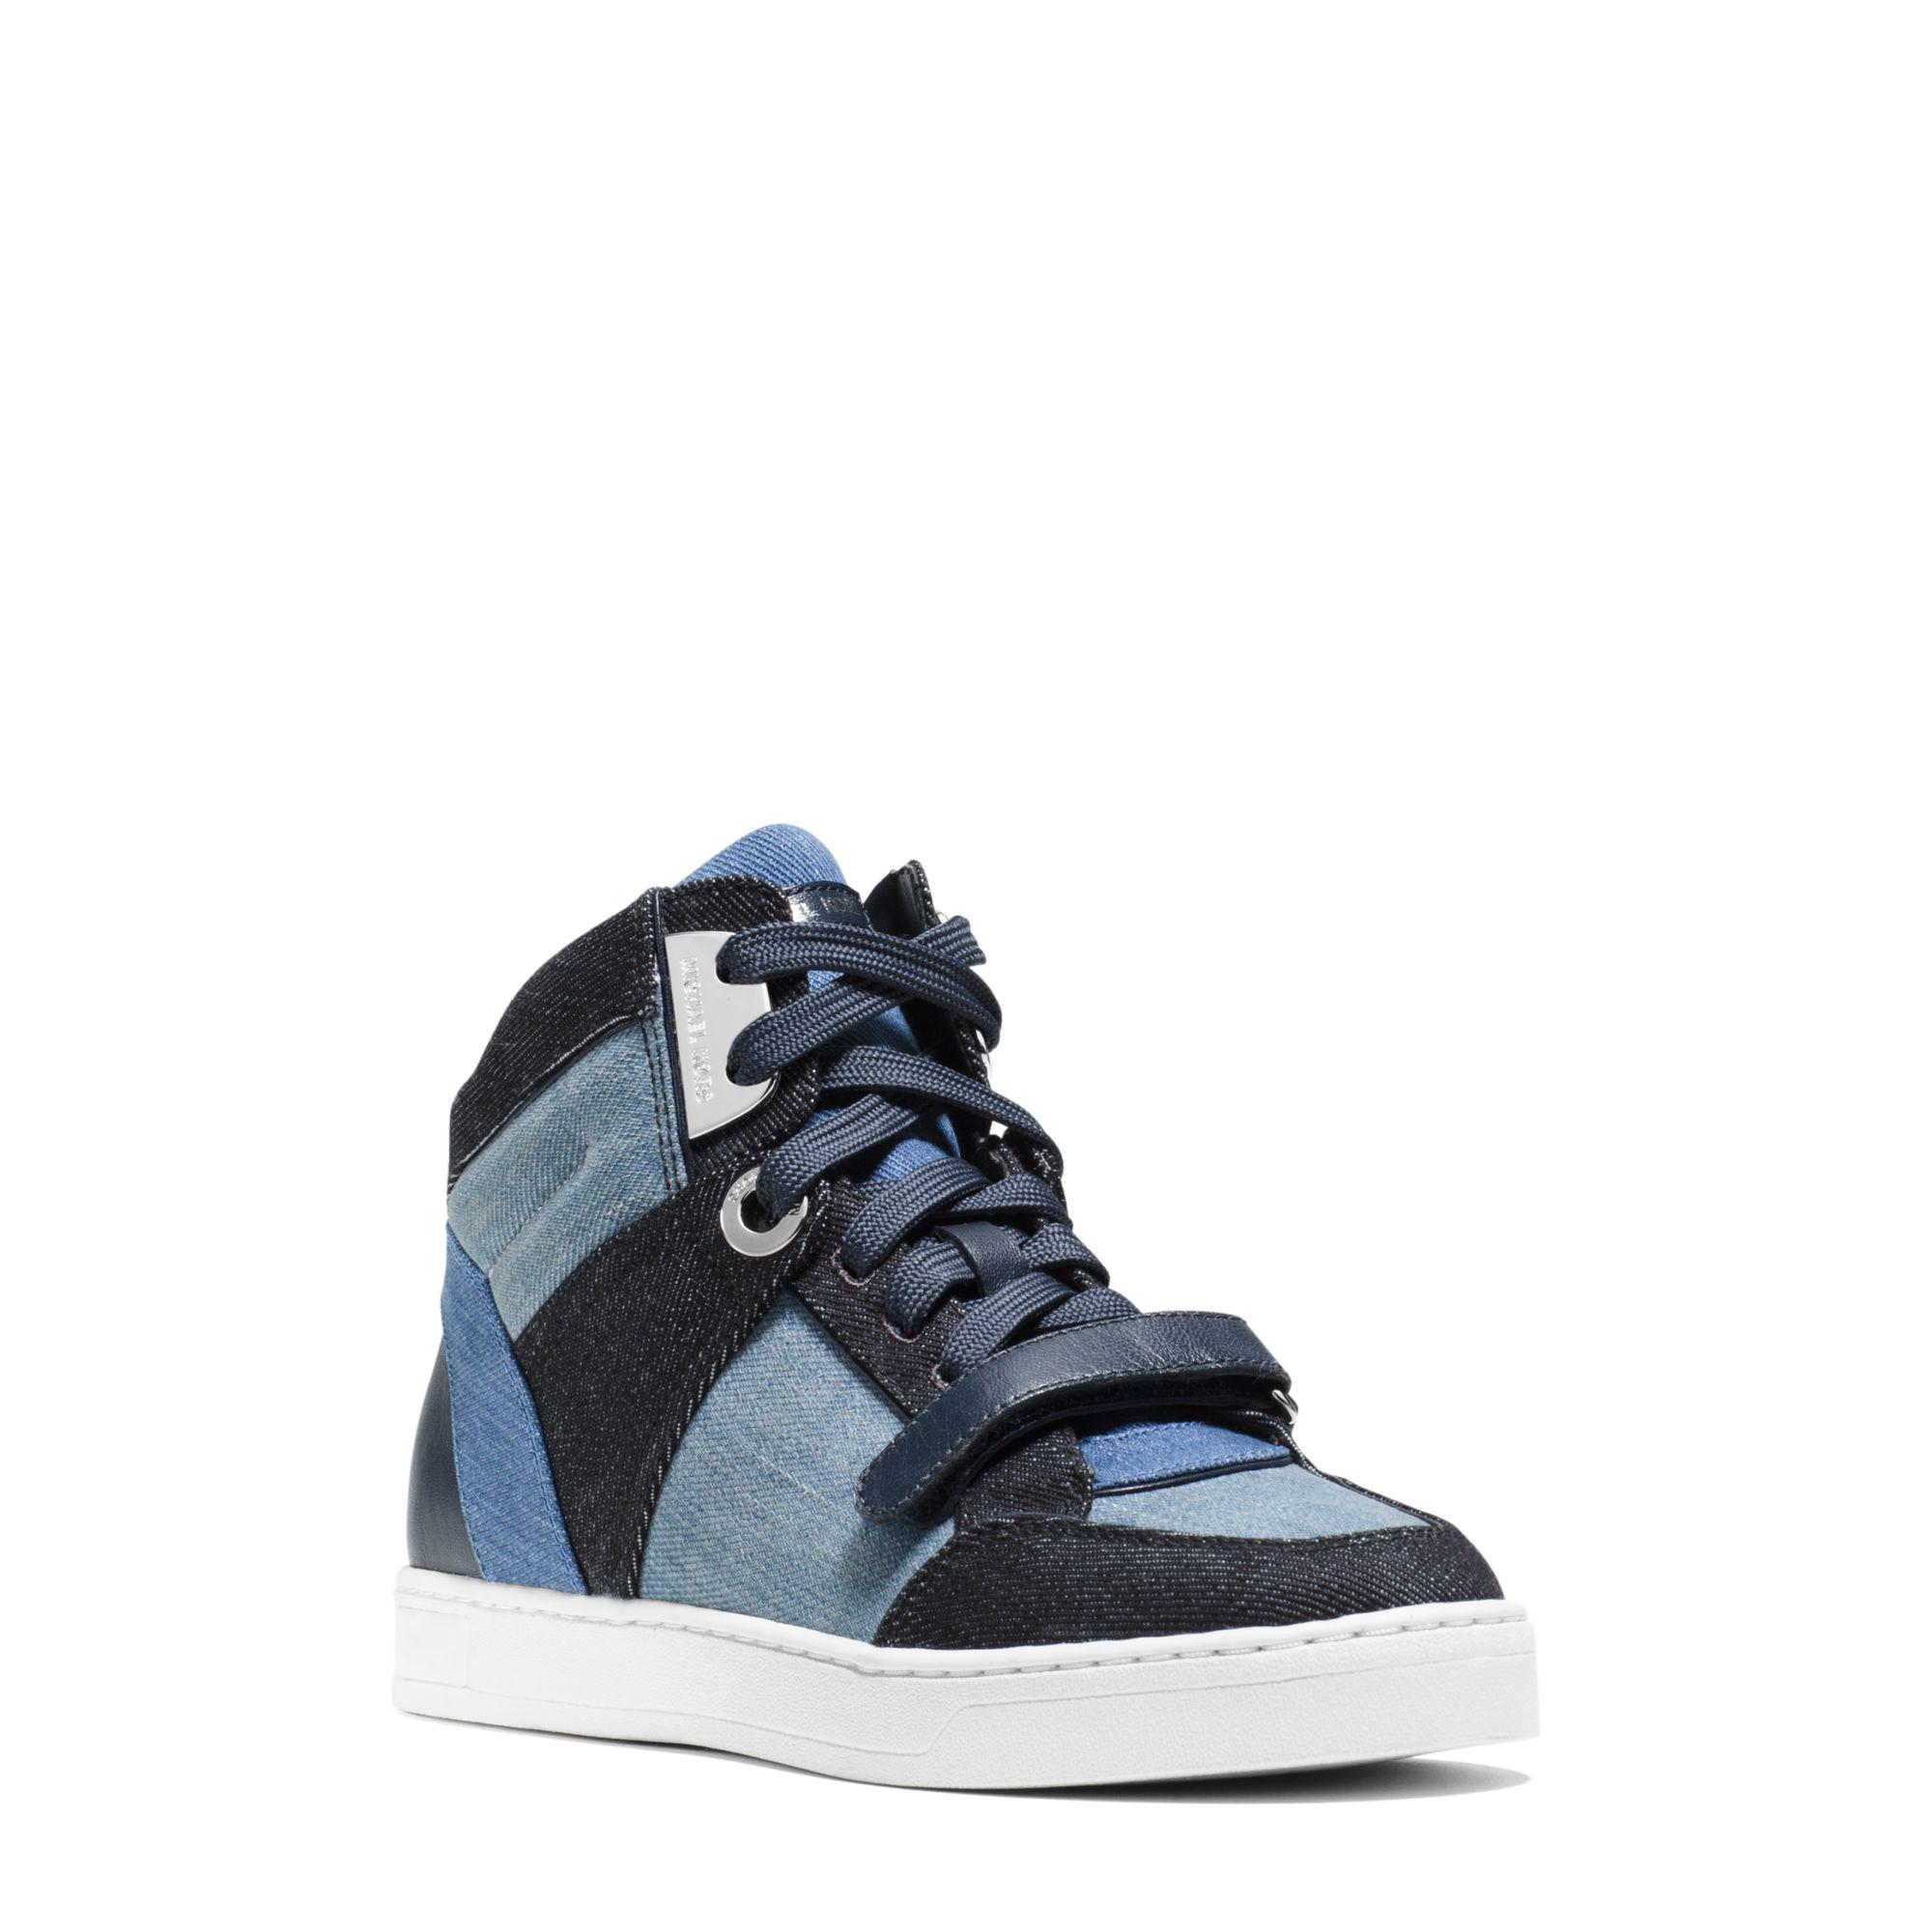 michael kors ollie high top denim sneaker in blue lyst. Black Bedroom Furniture Sets. Home Design Ideas